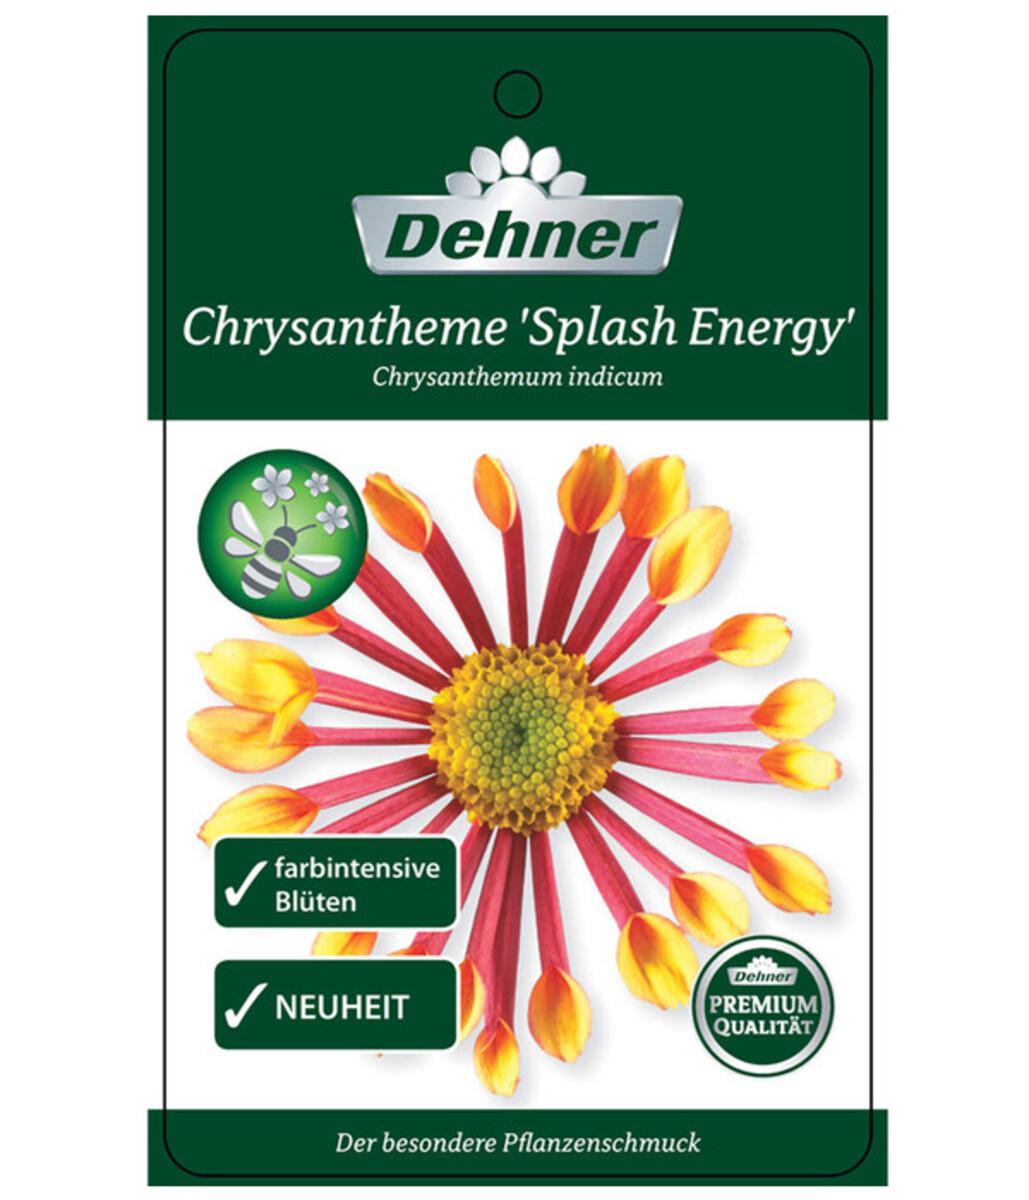 Bild 3 von Chrysantheme 'Splash Energy'